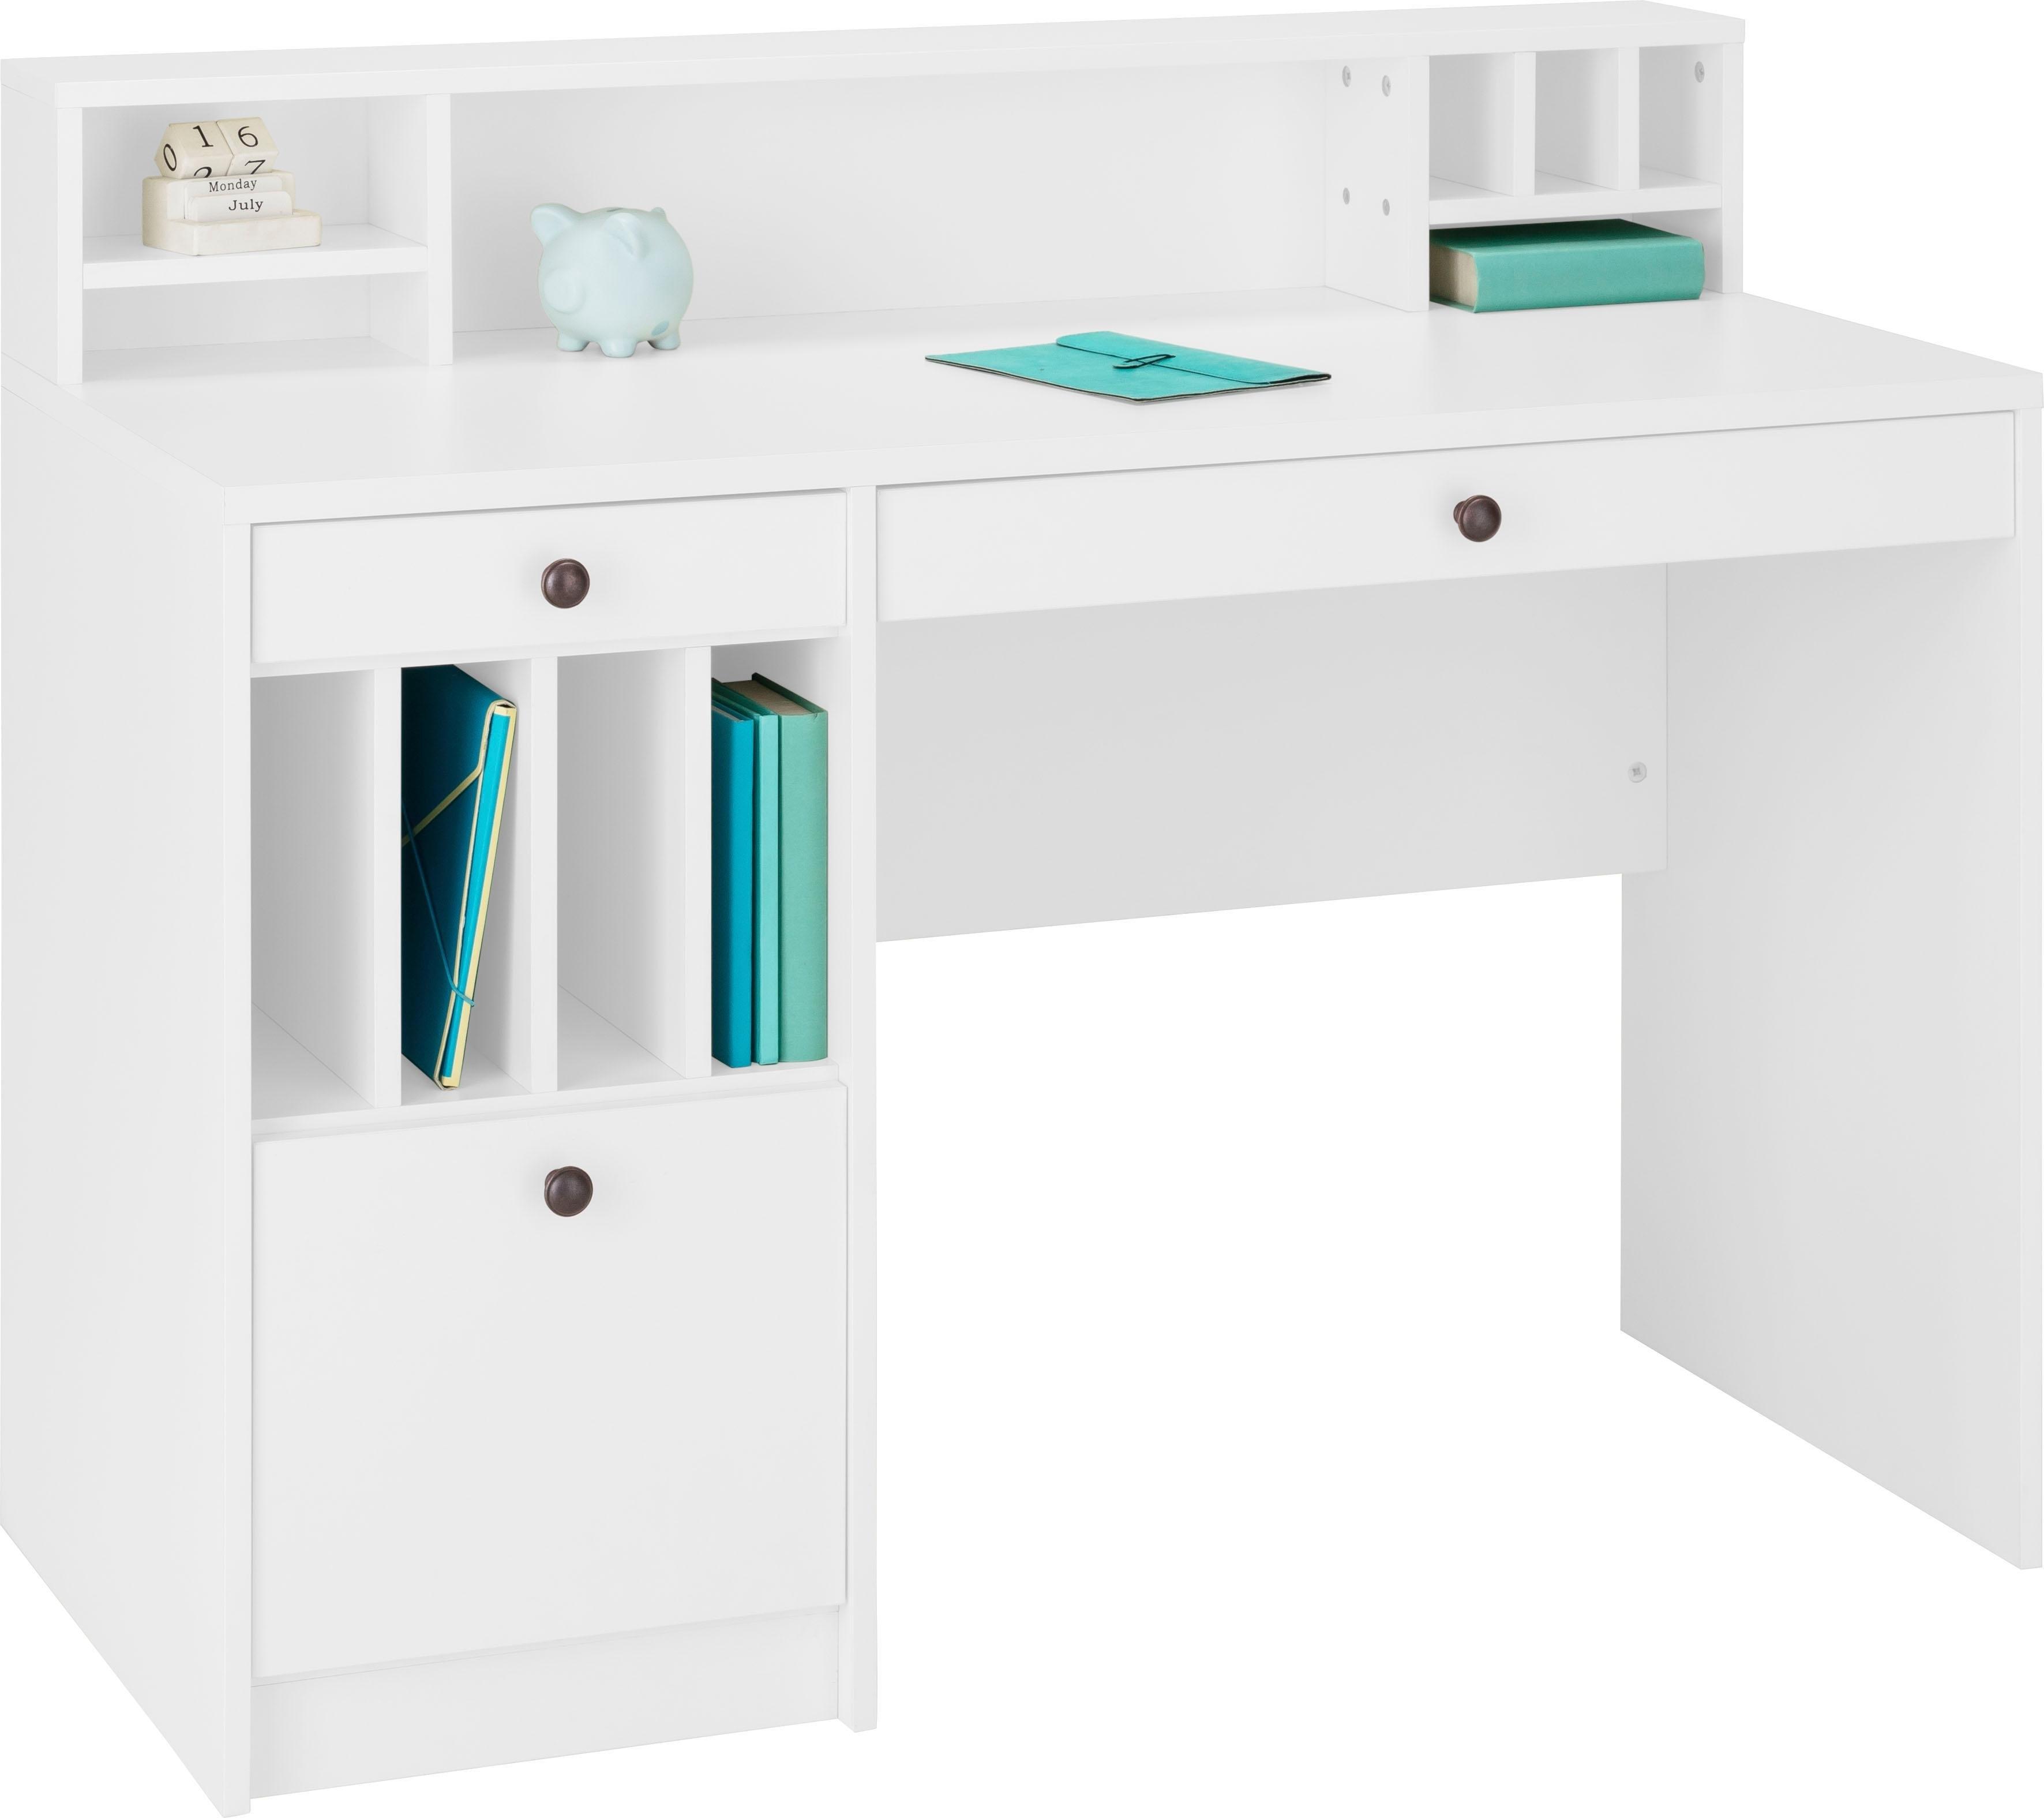 Places of Style bureau Licia Breedte 120 cm - verschillende betaalmethodes